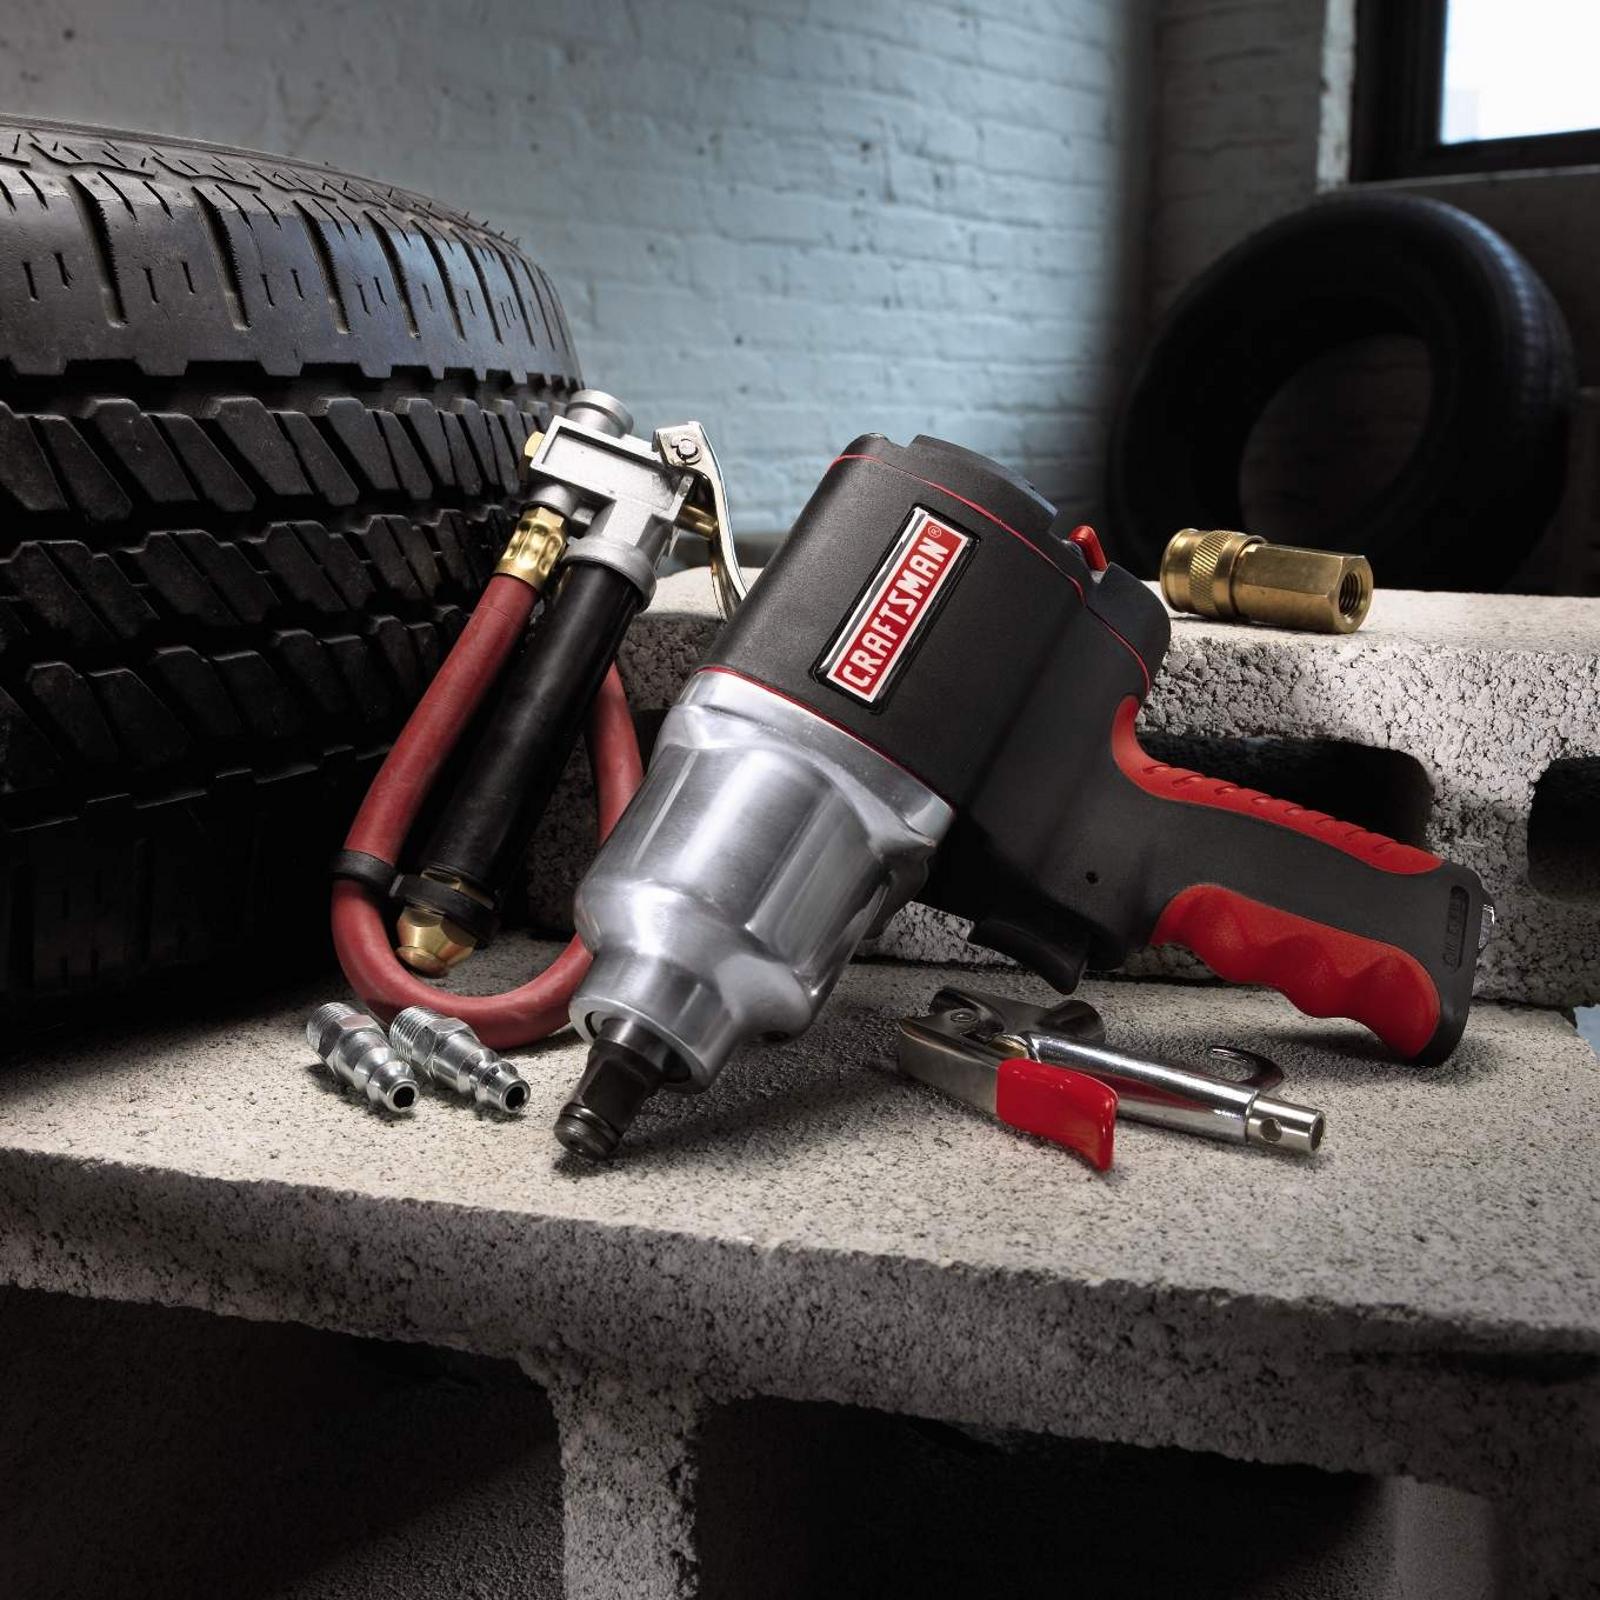 Craftsman 6 Piece Tire Maintenance Kit